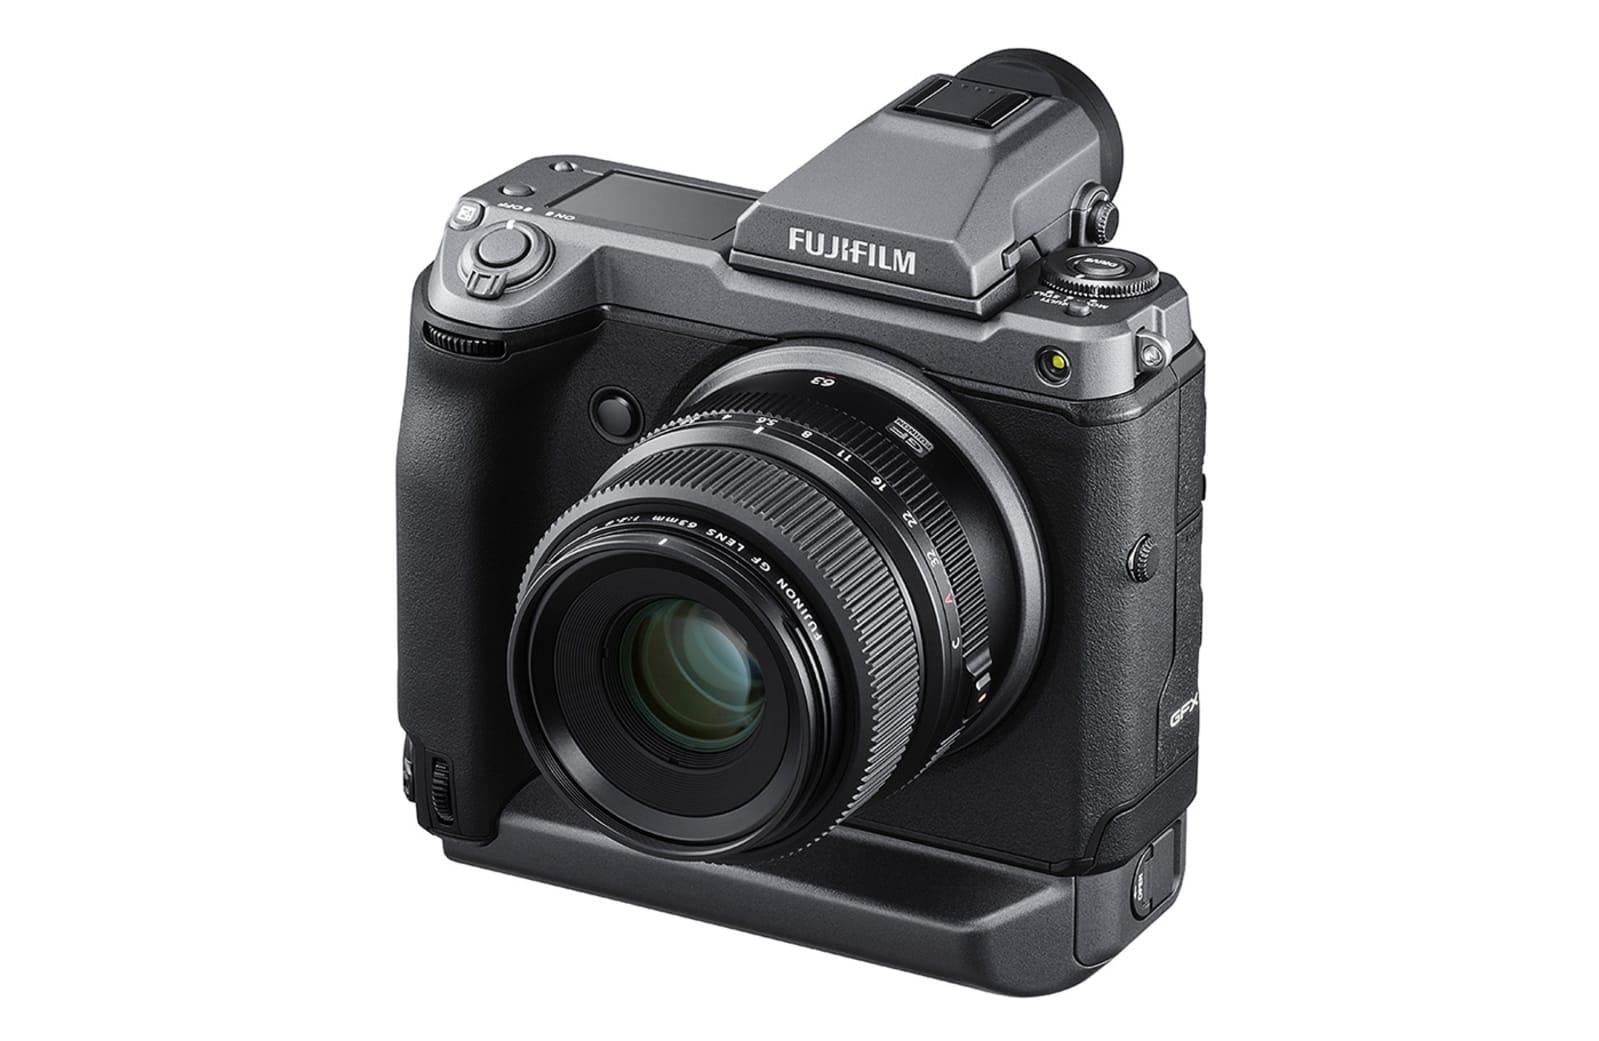 Fujifilm launches the groundbreaking 102-megapixel